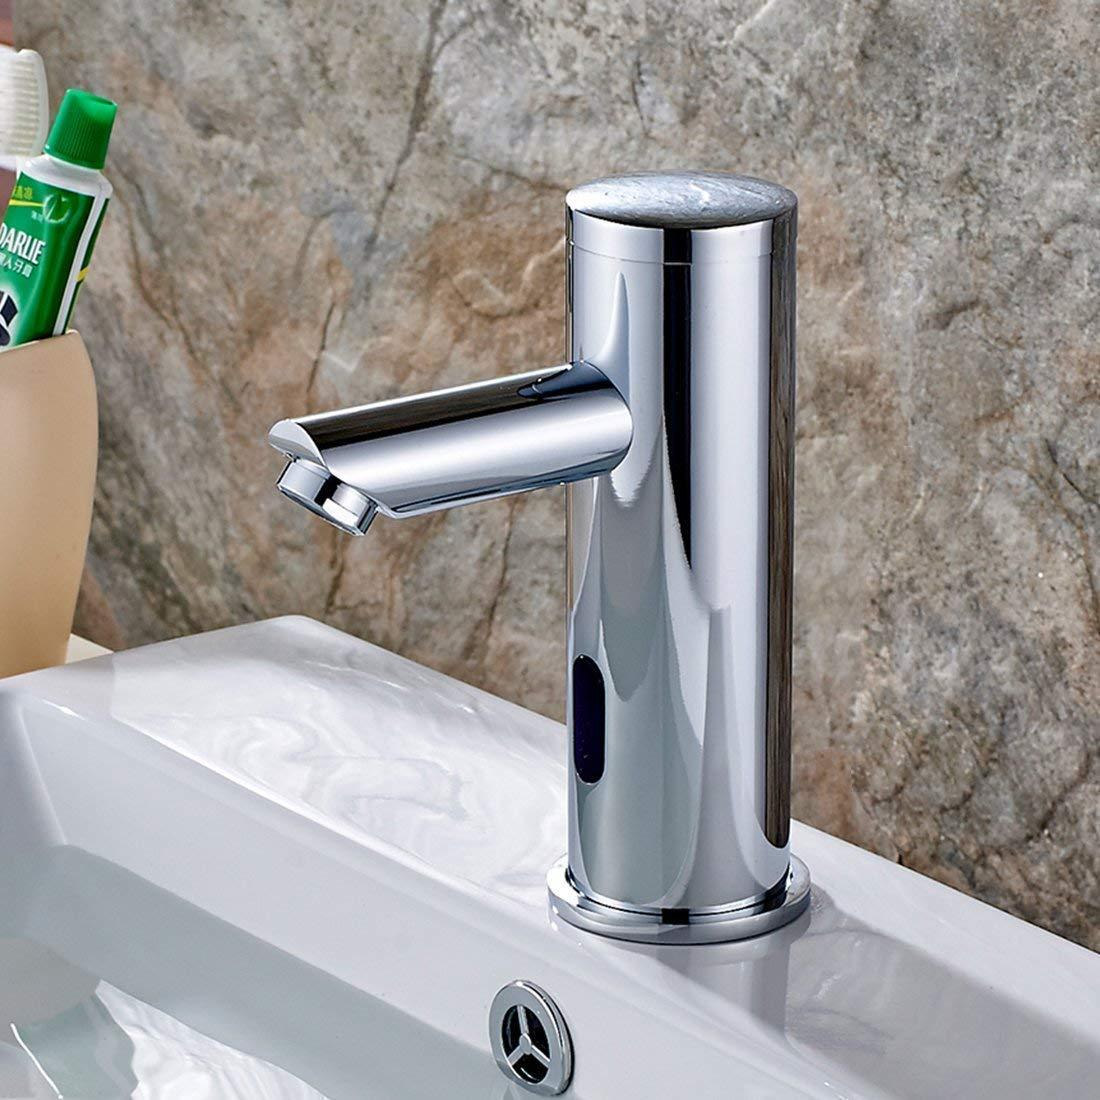 aimadi Sensor de infrarrojos grifo automá tico Inducció n bañ o grifo agua ahorrar waschtisha rmatur –  Lavabo baterí a operativos cromo pulgada